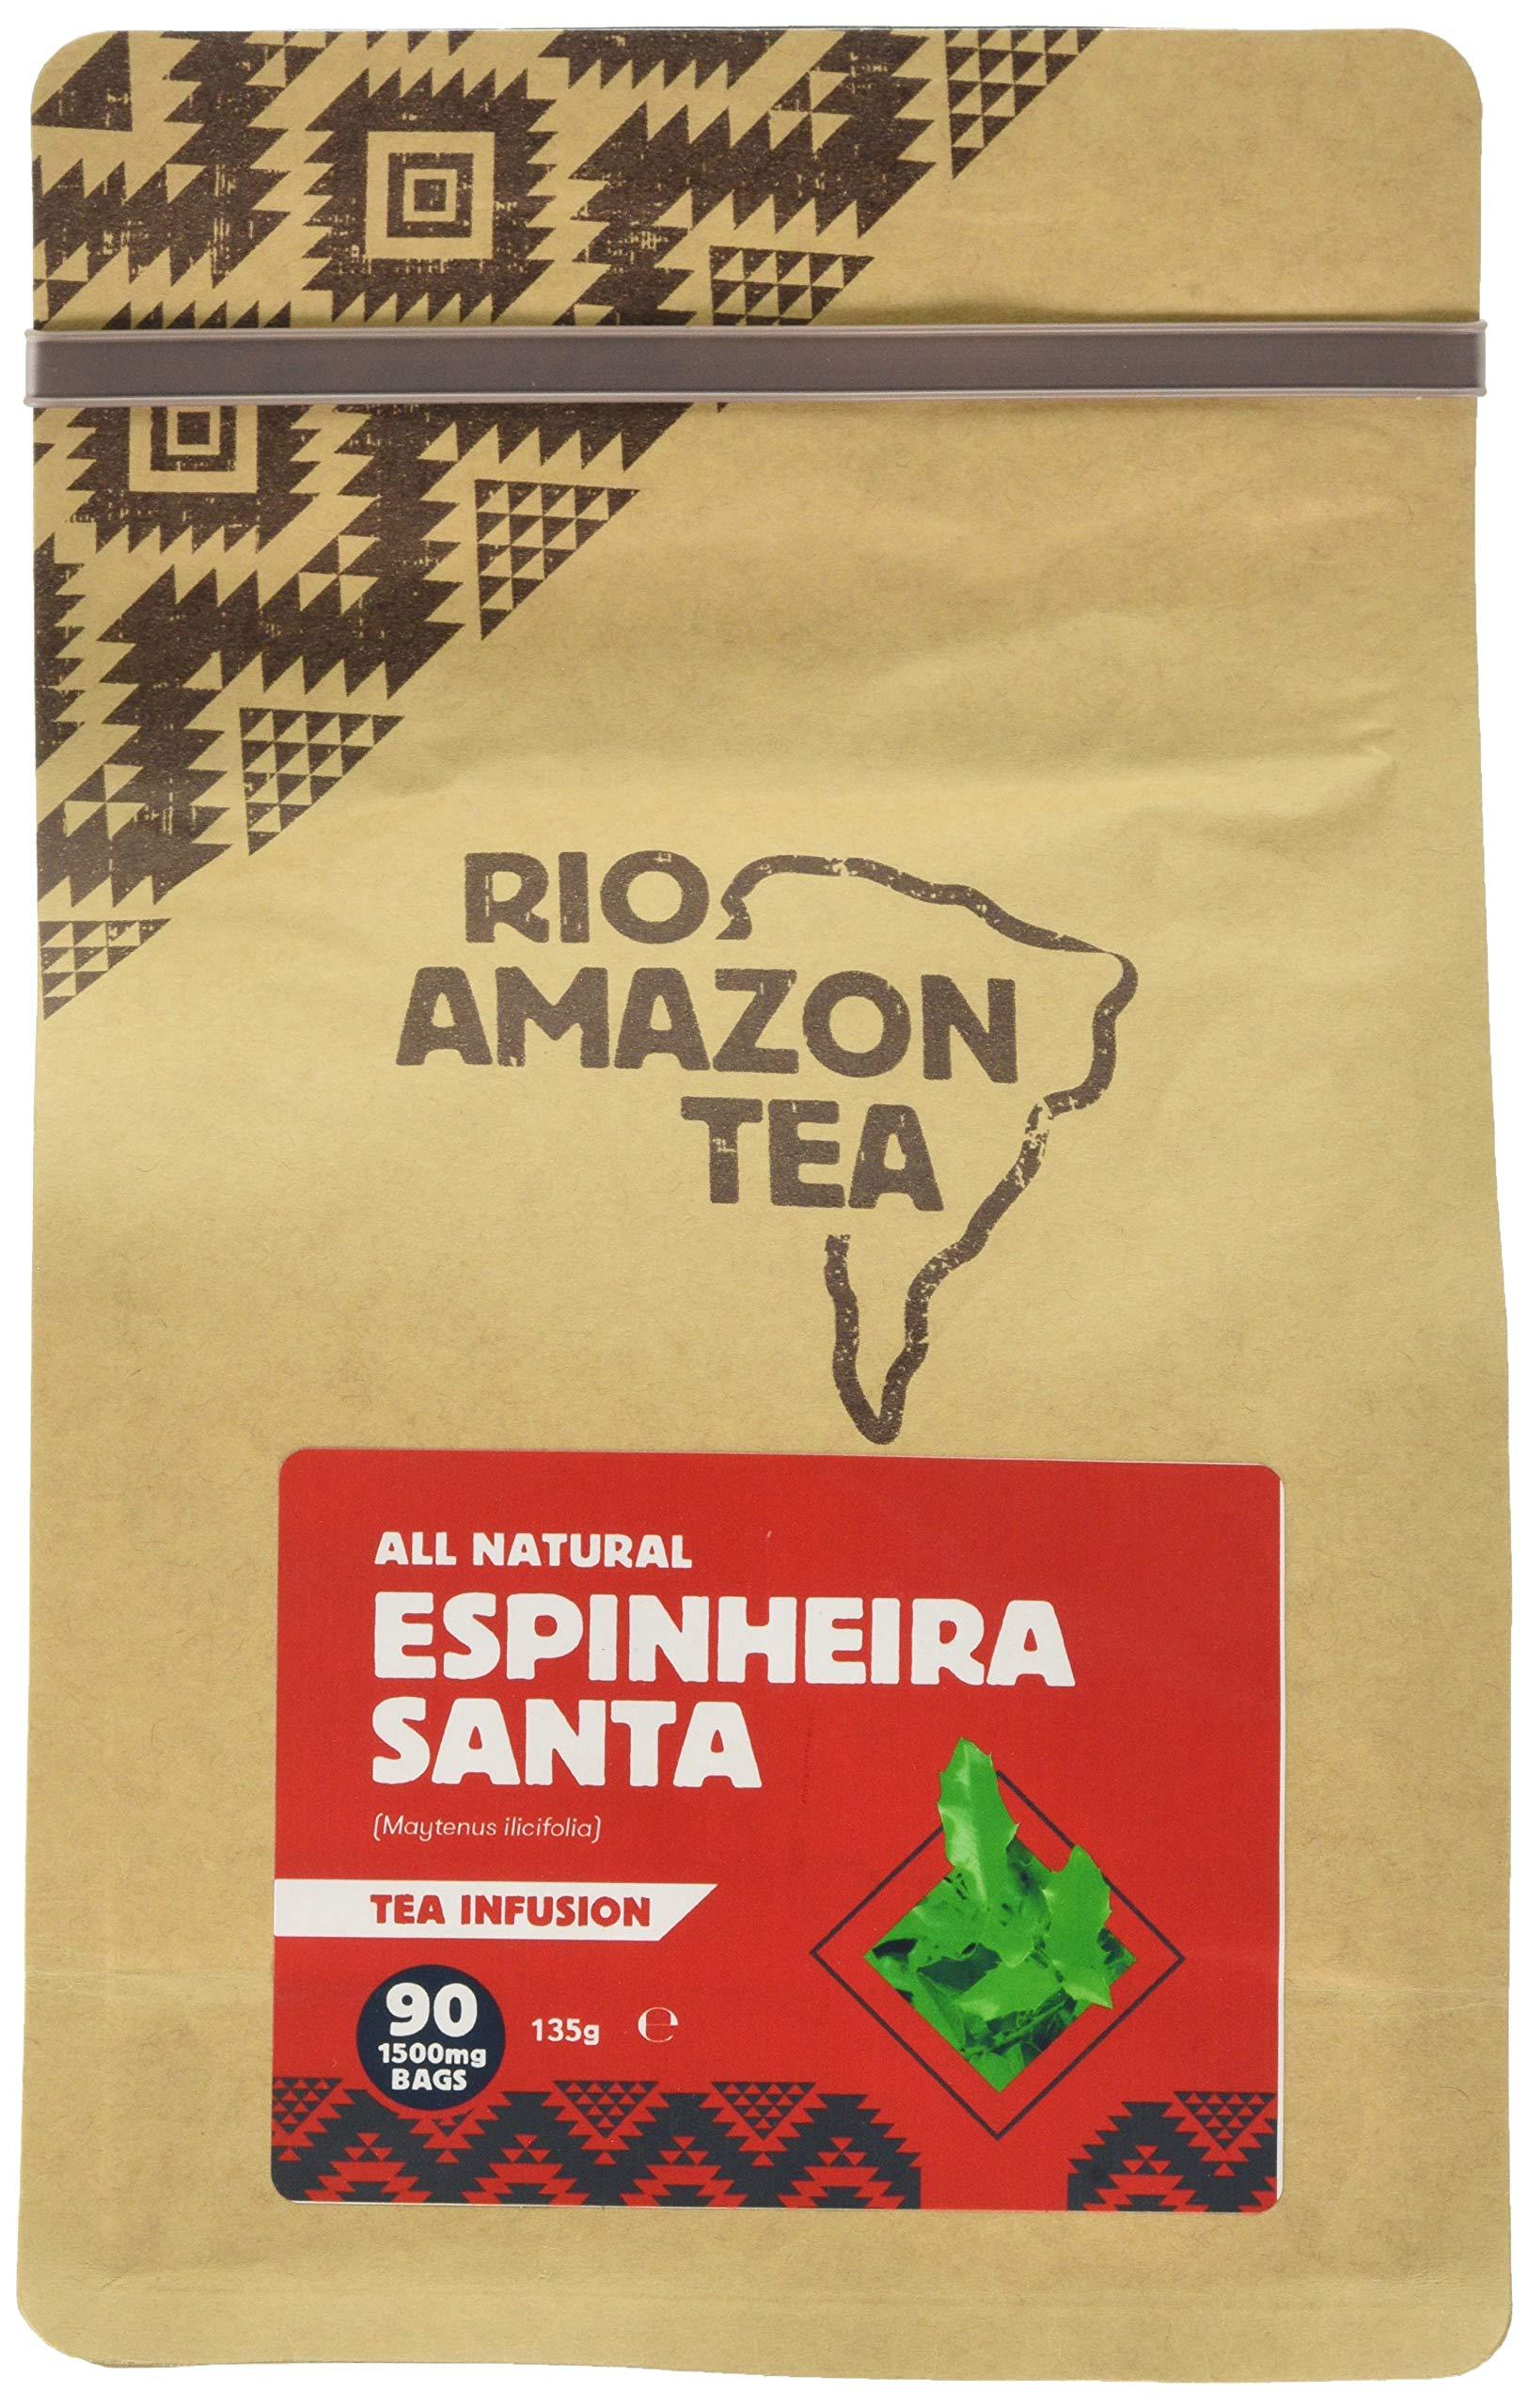 Rio Amazon Espinheira Santa 90 Teabags